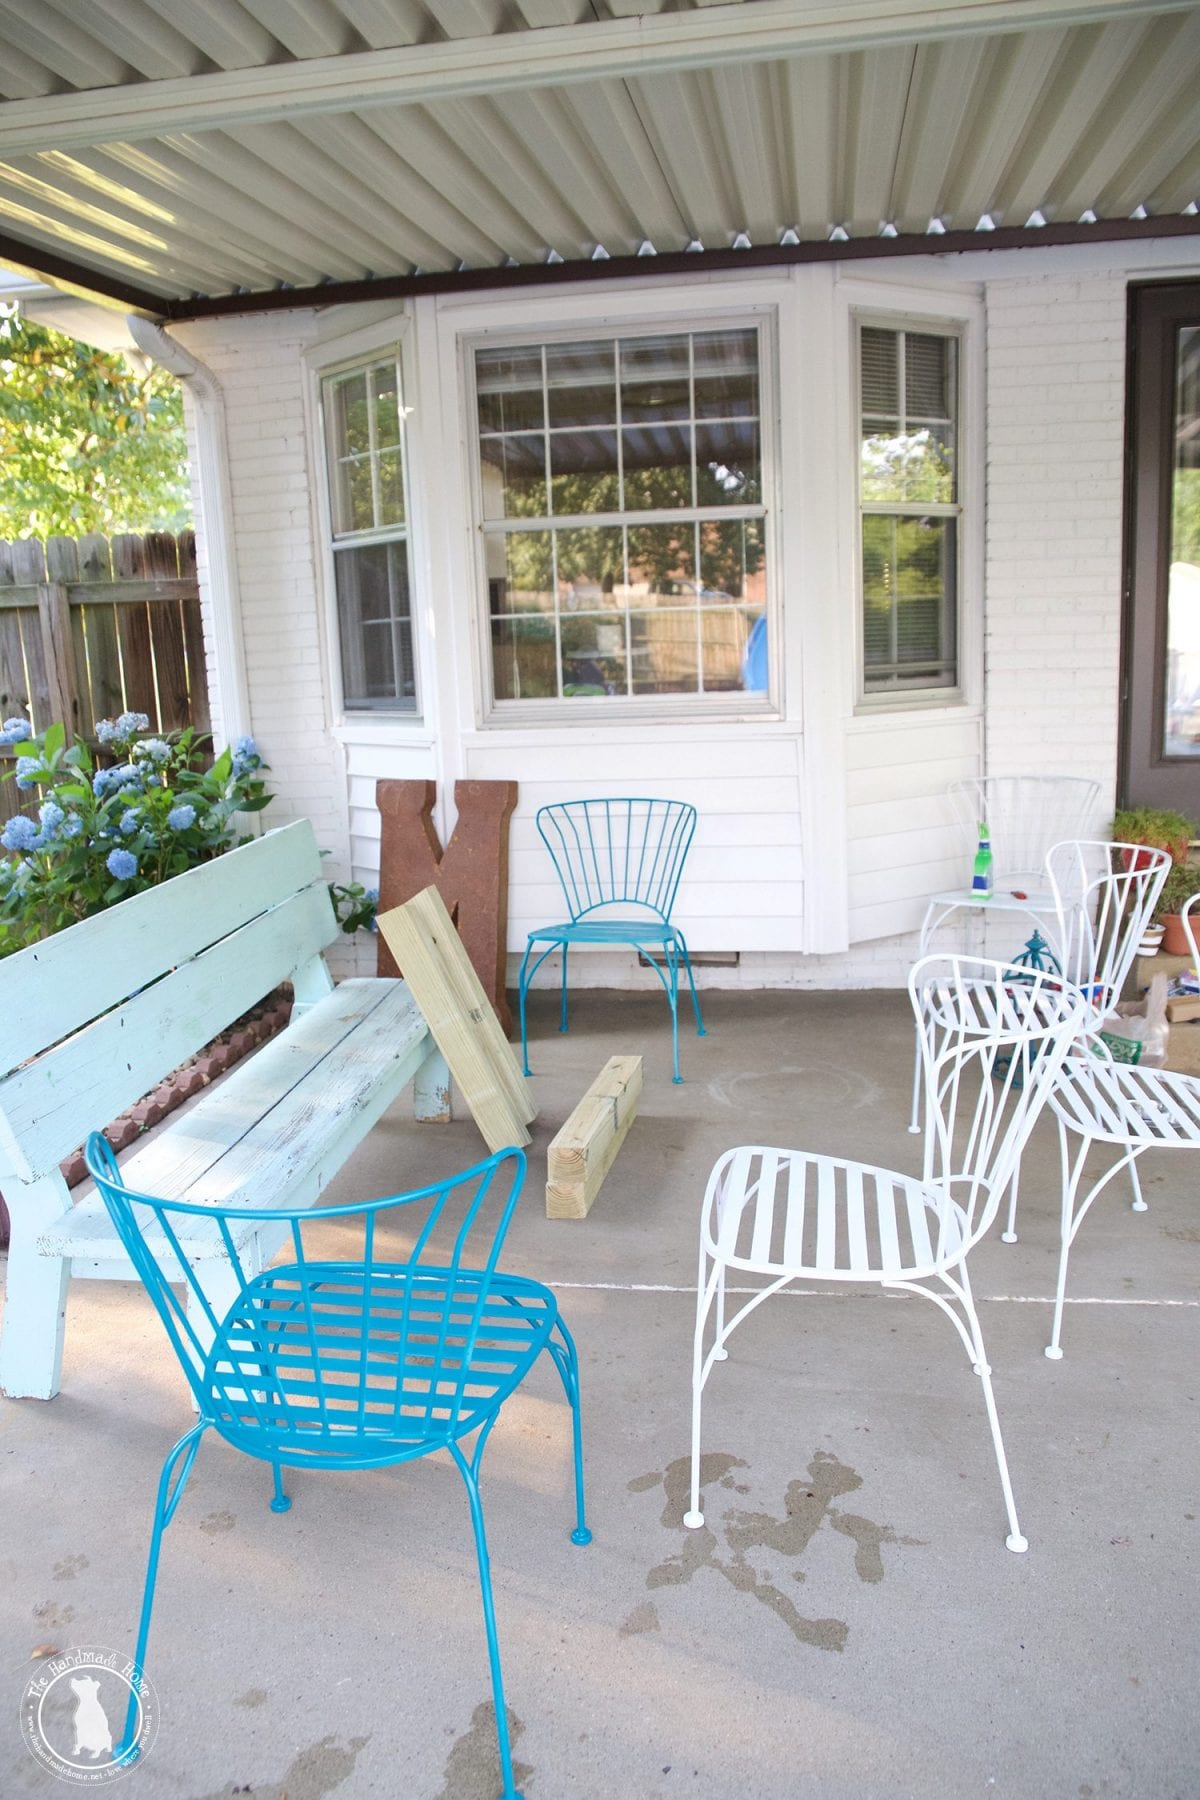 Patio Furniture Rehab at Home and Interior Design Ideas